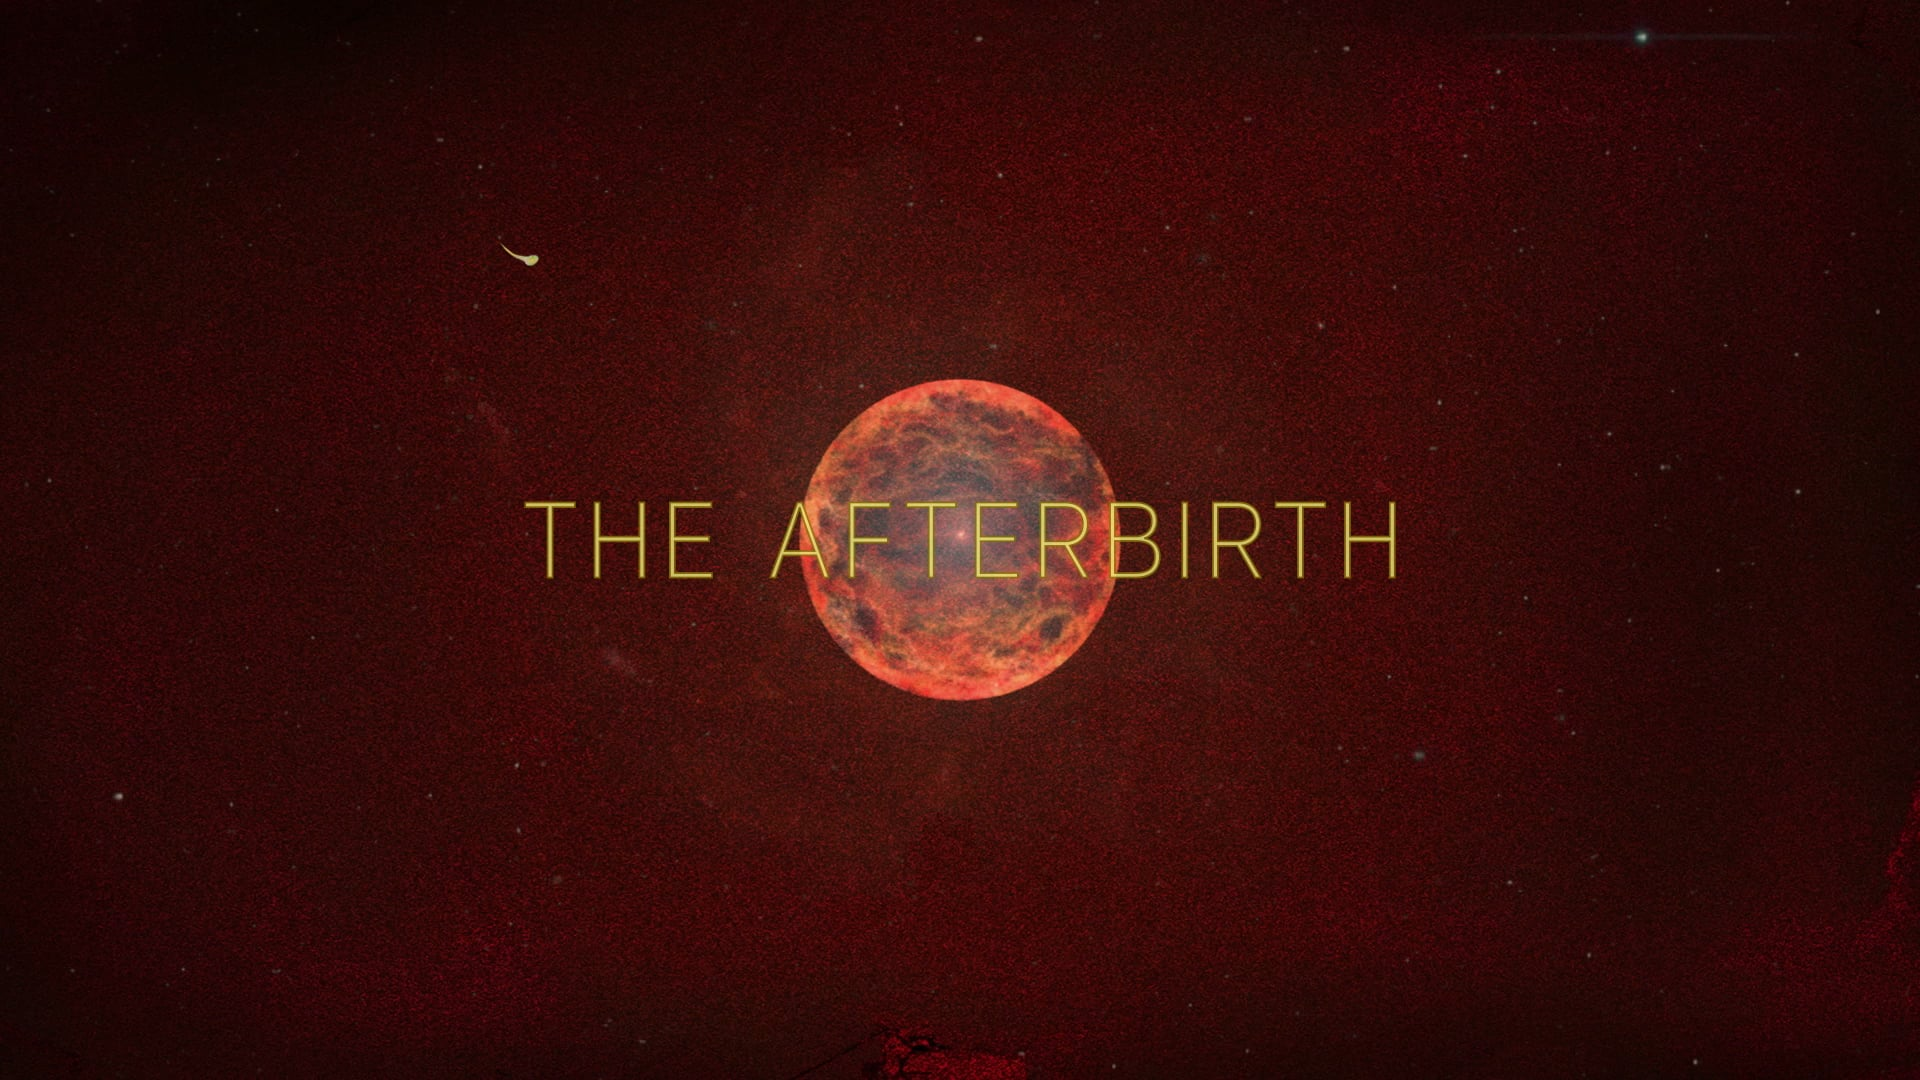 The afterbirth (short film teaser trailer 2018)